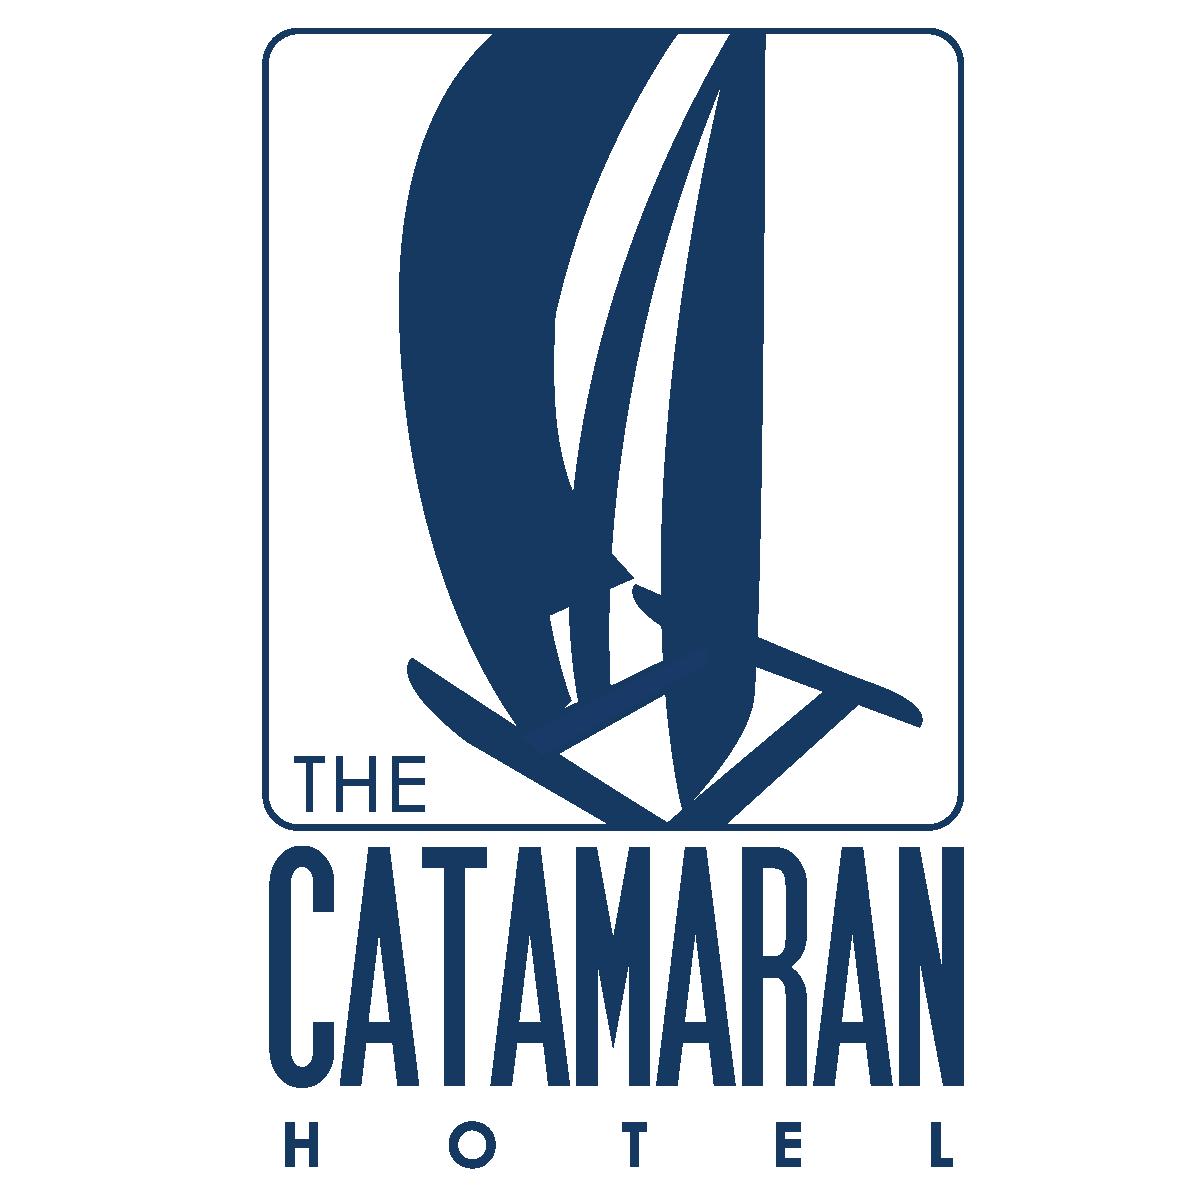 Catamaran Hotel – Antigua